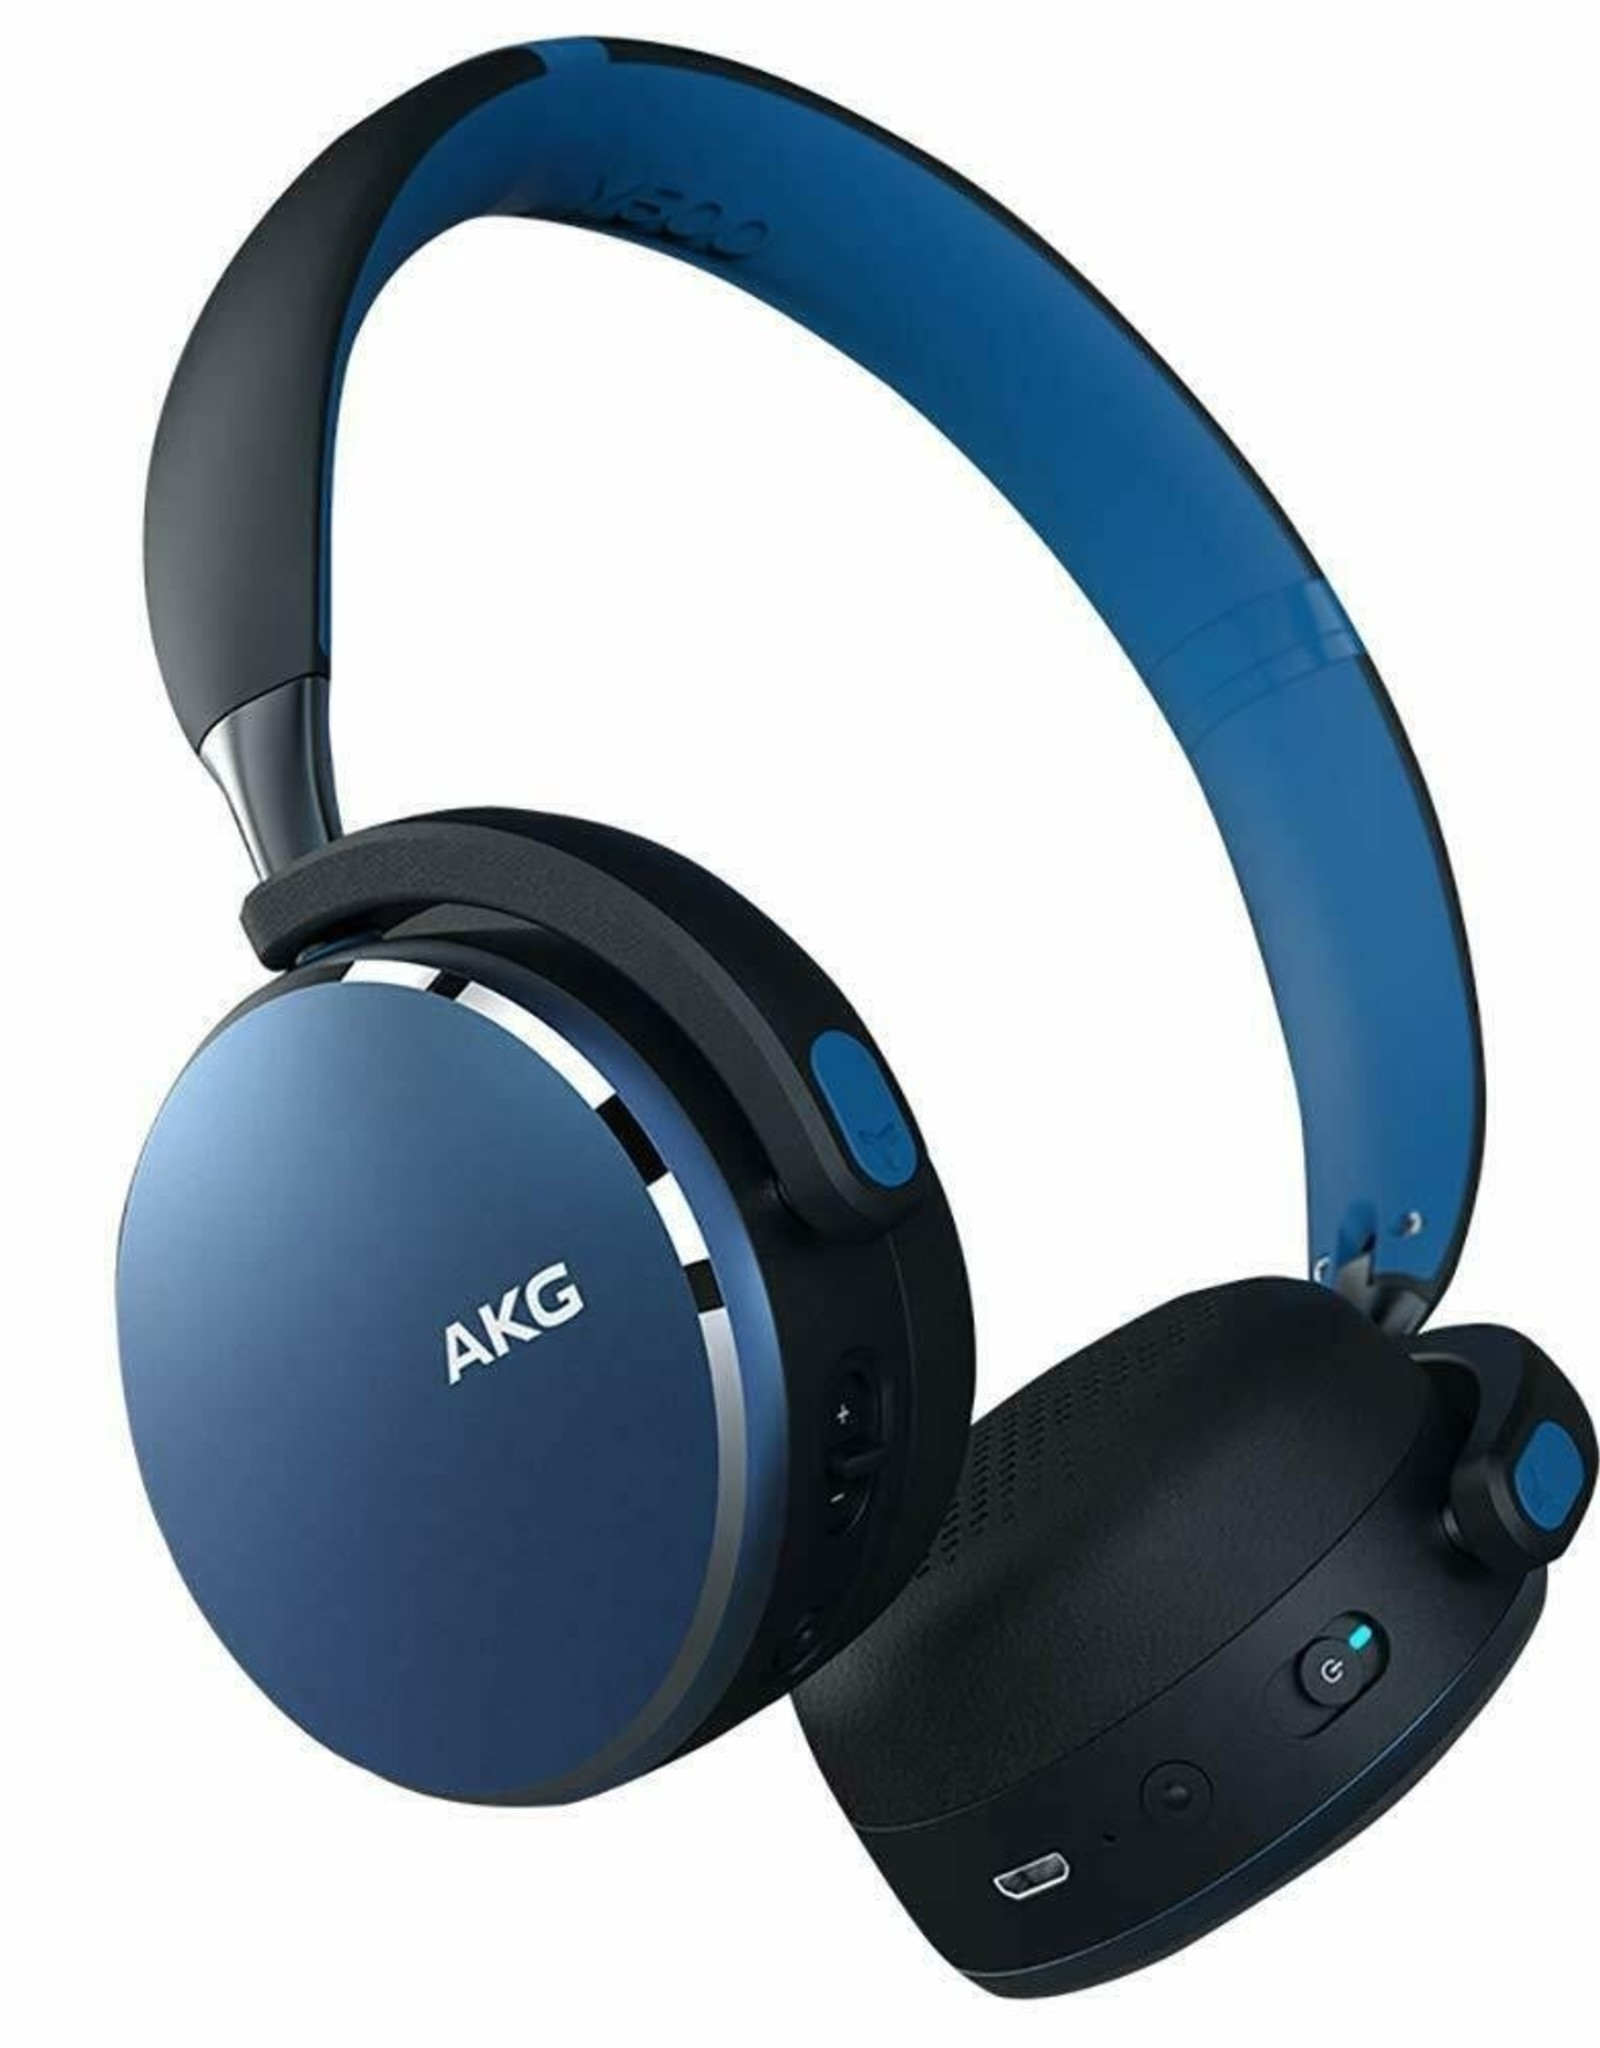 AKG AKG Y500 | Headphones with mic - on-ear - Bluetooth - wireless - blue